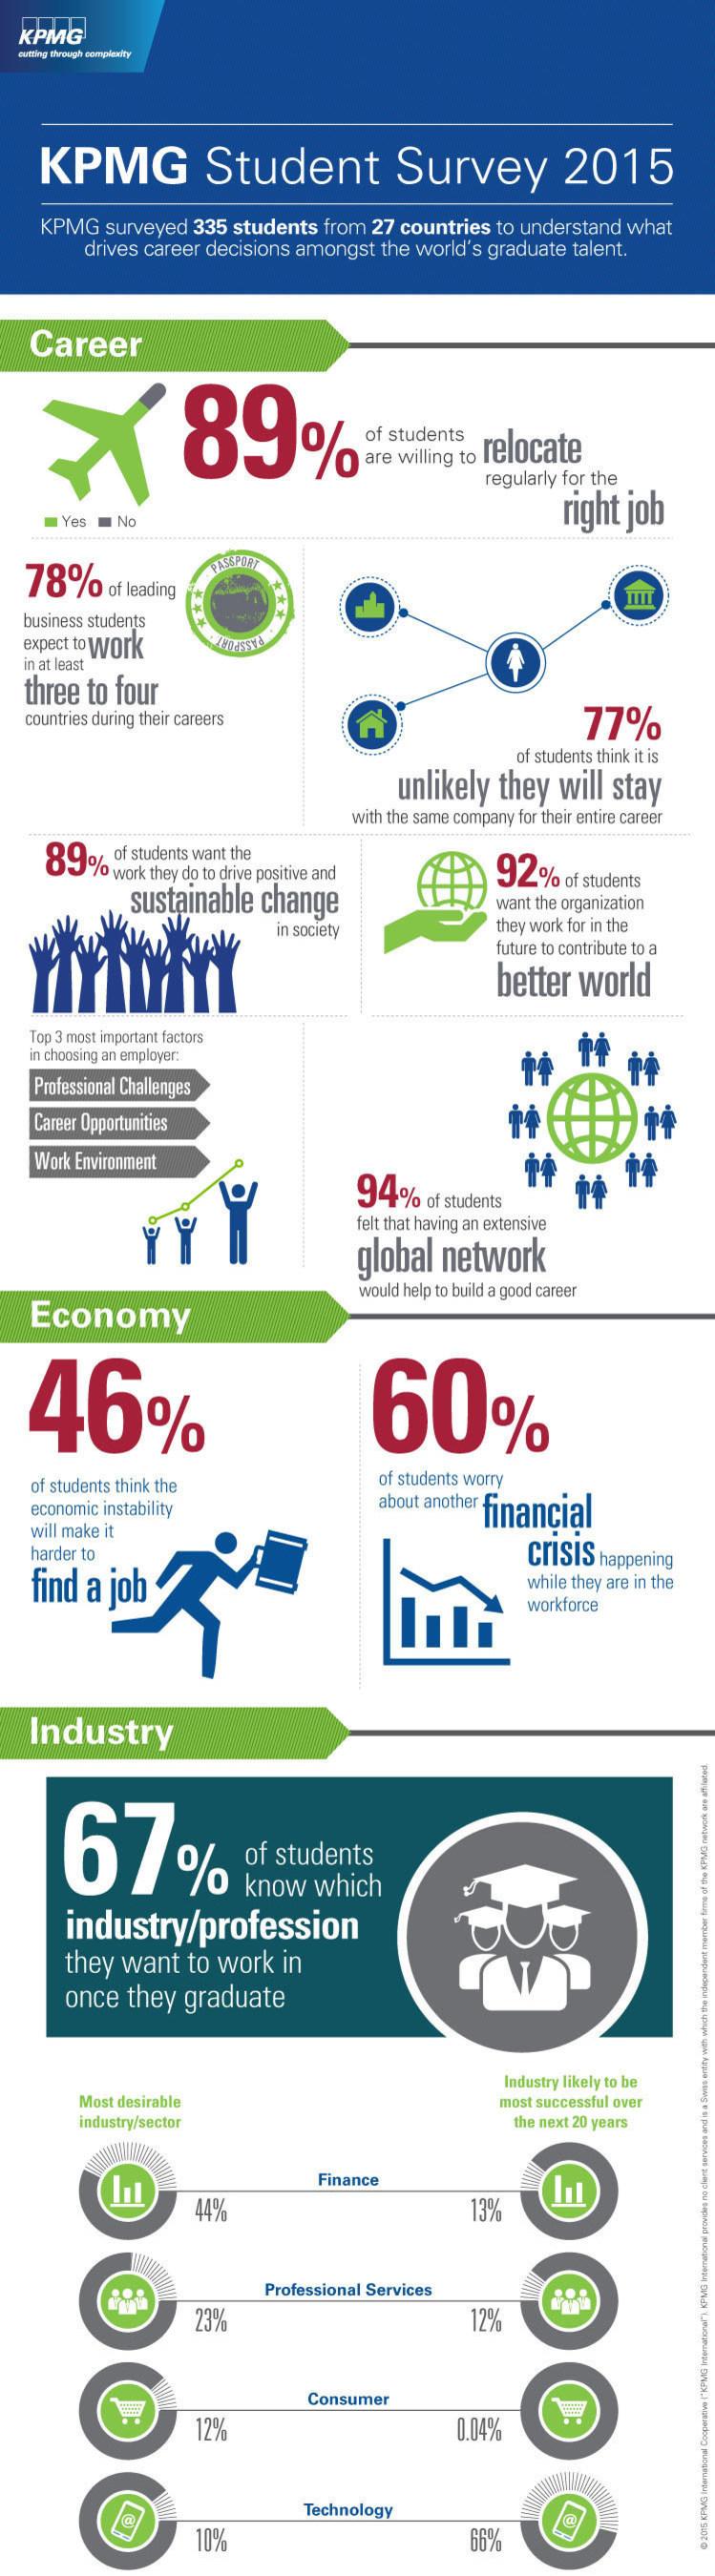 KPMG Student Survey 2015 Infographic